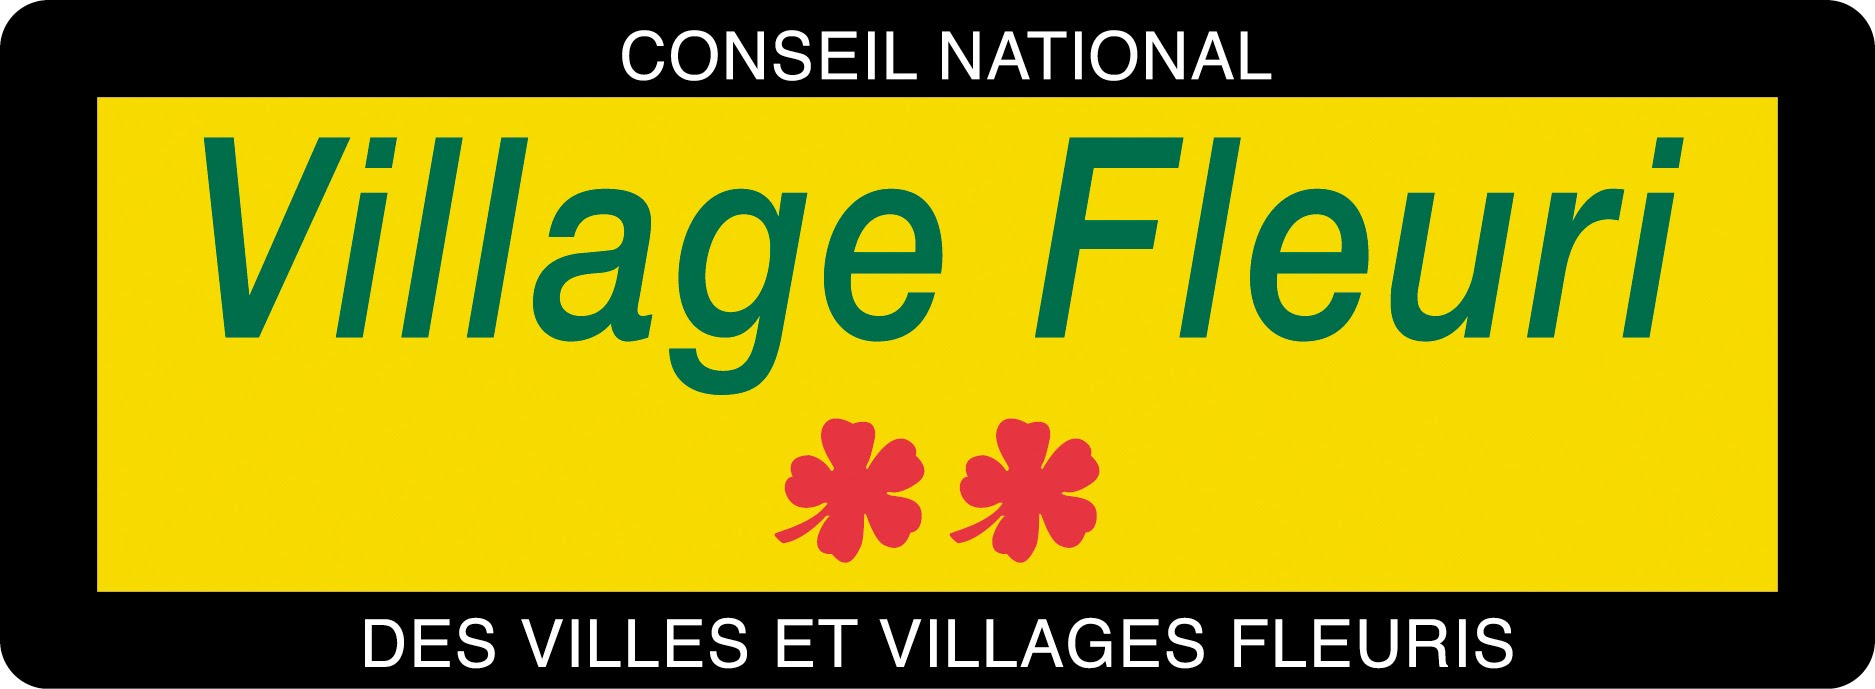 panneau-village-fleuri-visuel-2fleurs.jpg